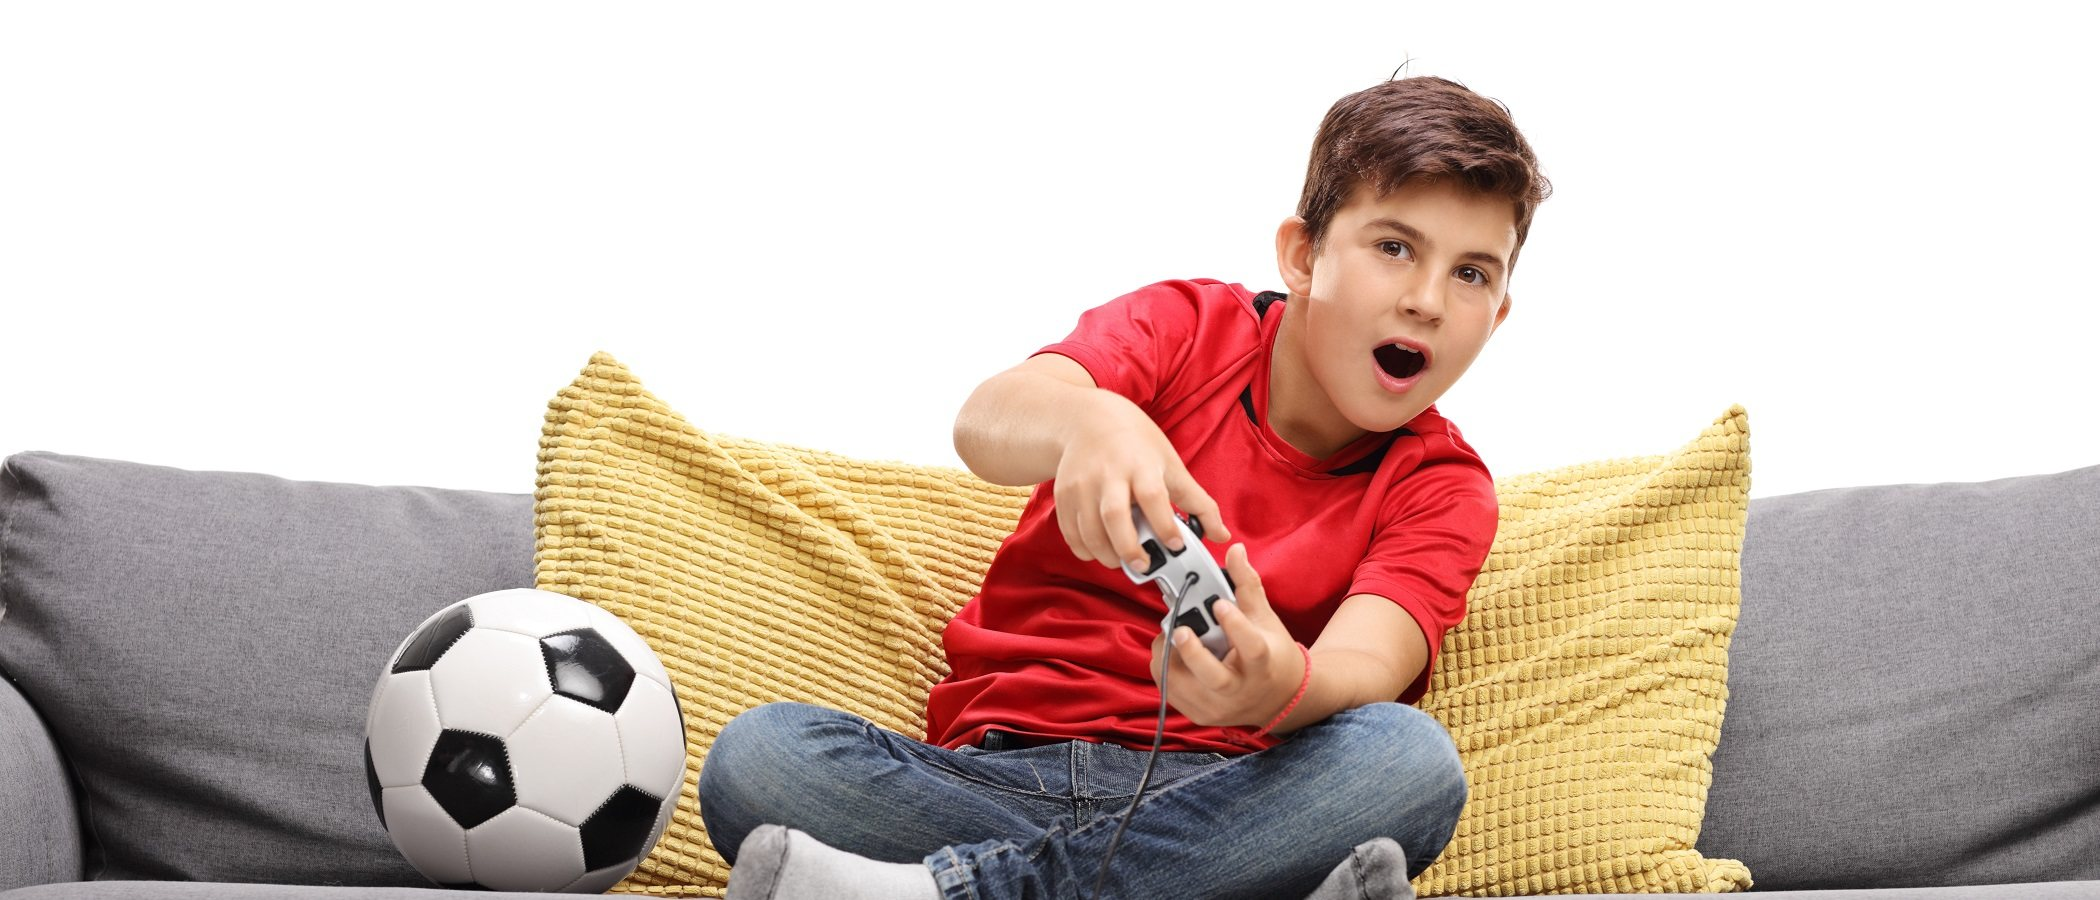 3 problemas tecnológicos que tus hijos NUNCA entenderán